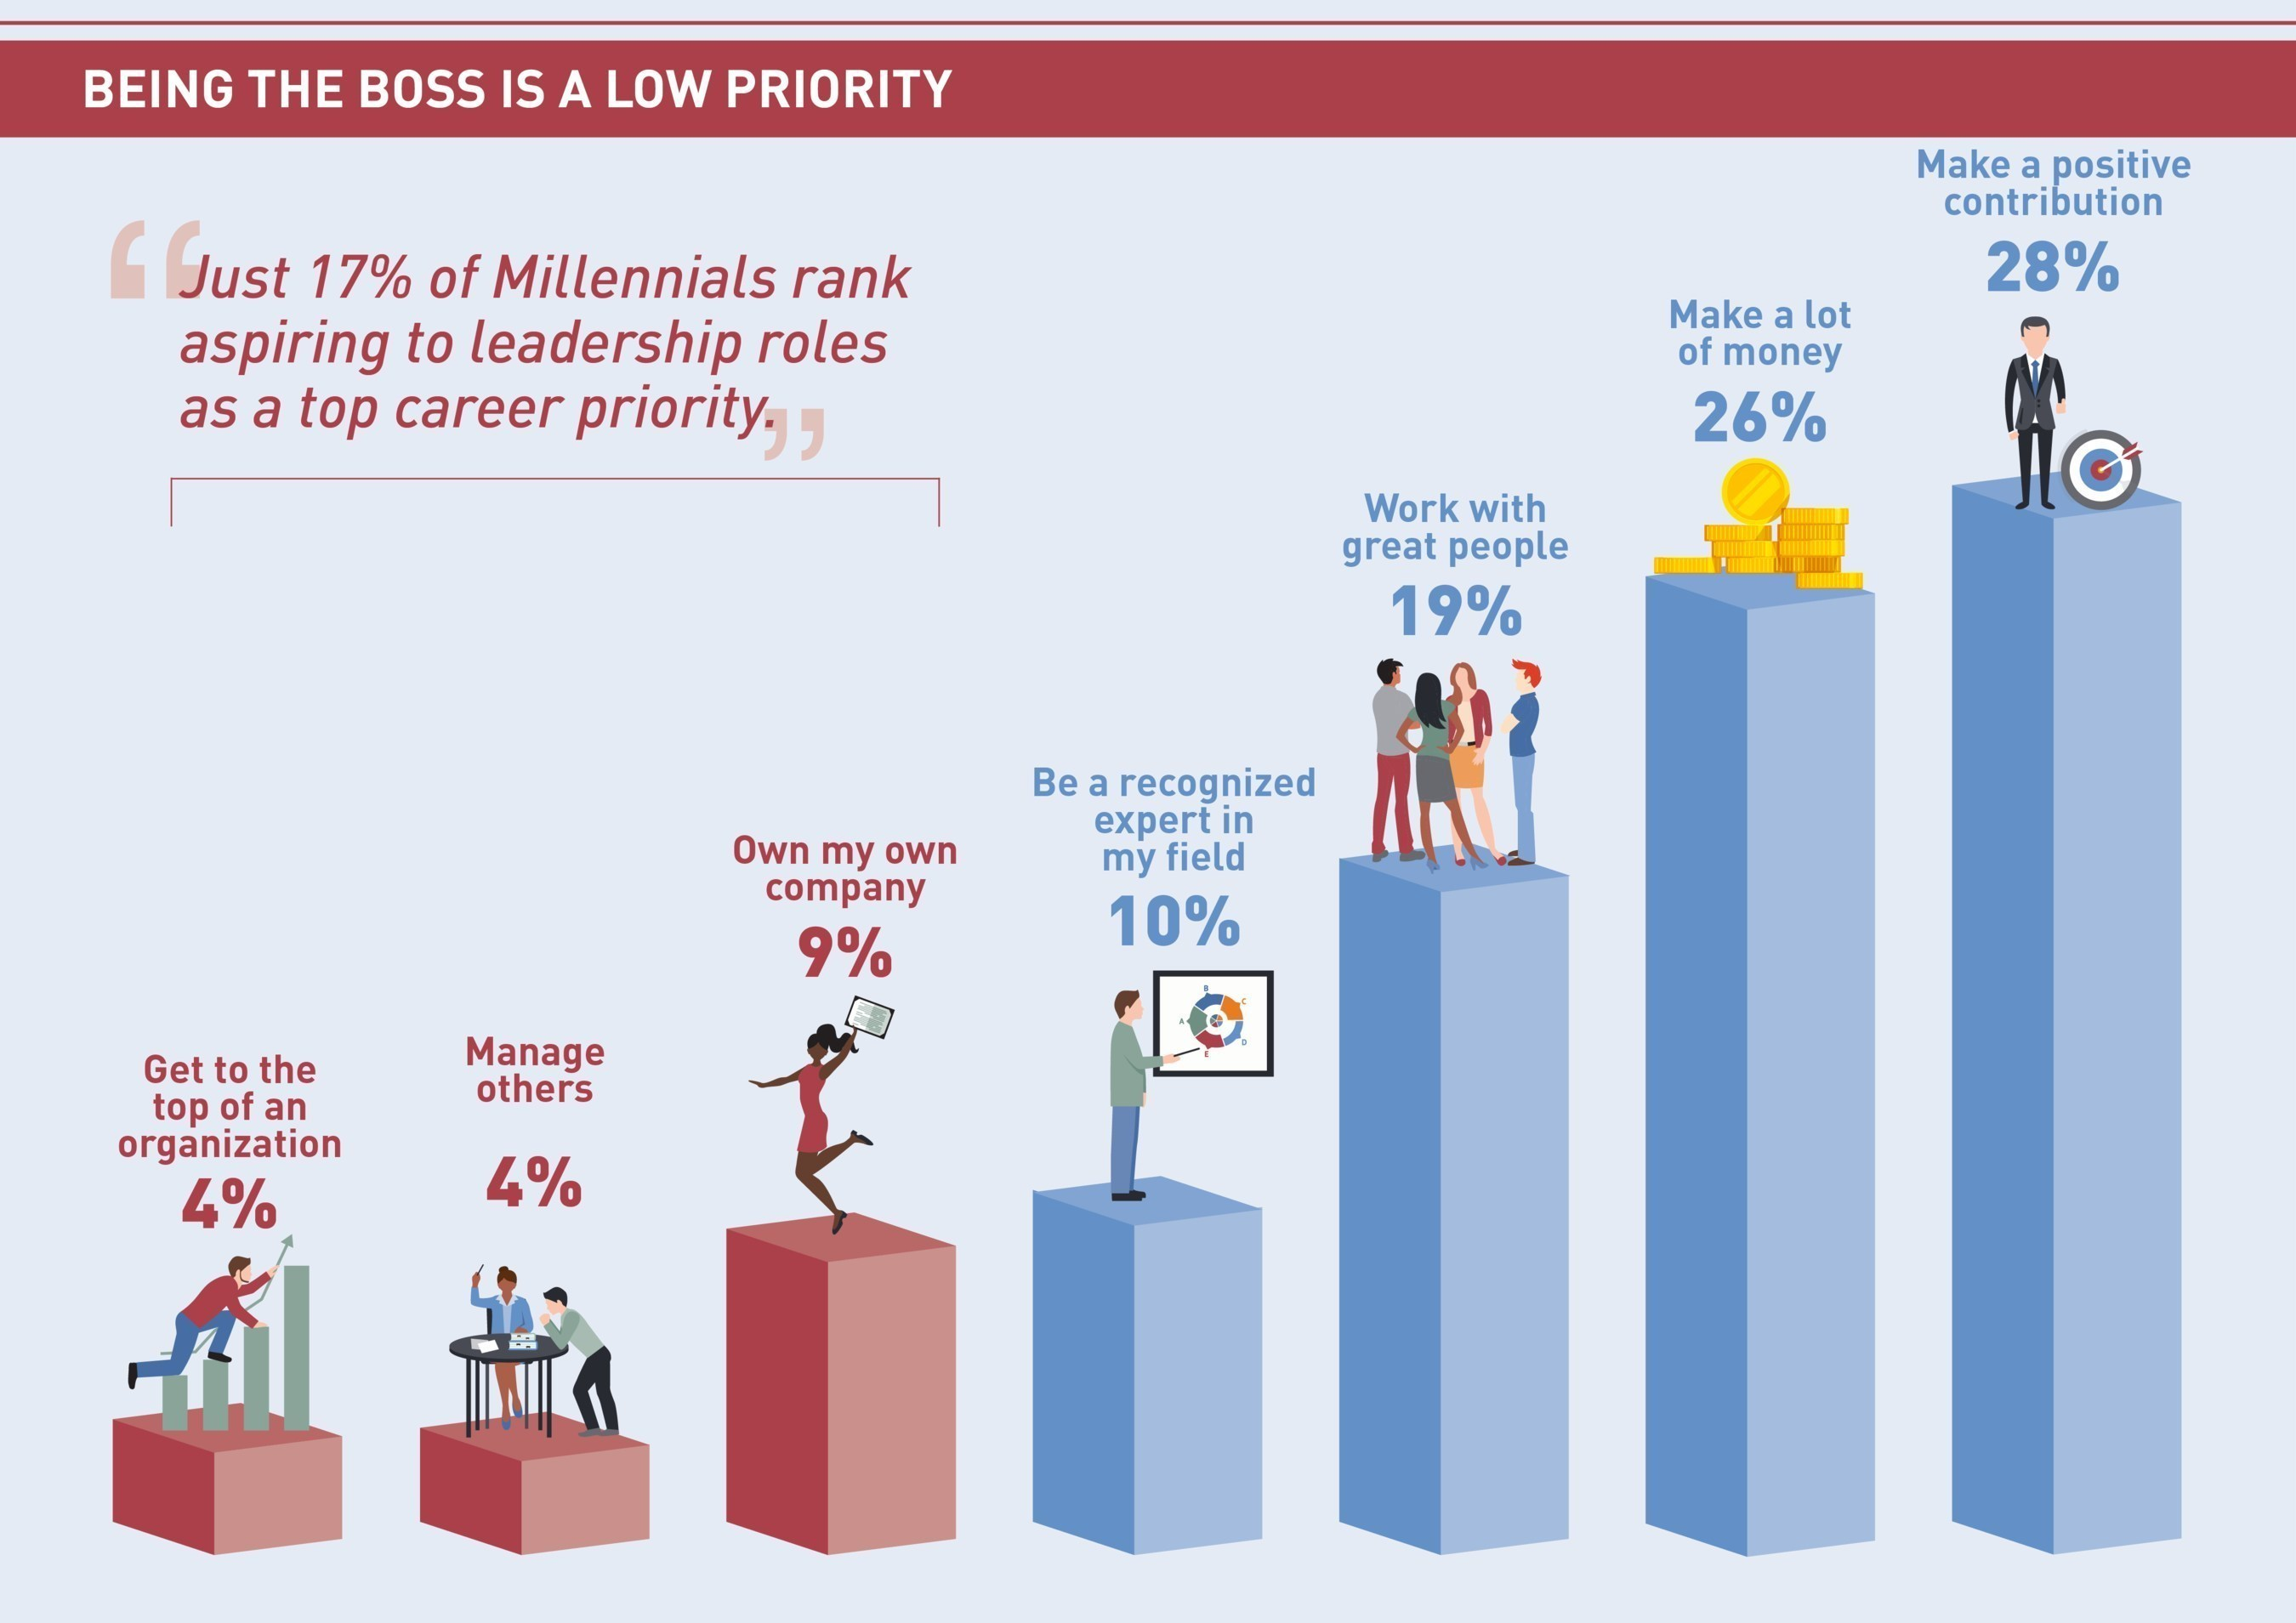 Just 17% of American Millennials rank aspiring to leadership roles as a top career priority.